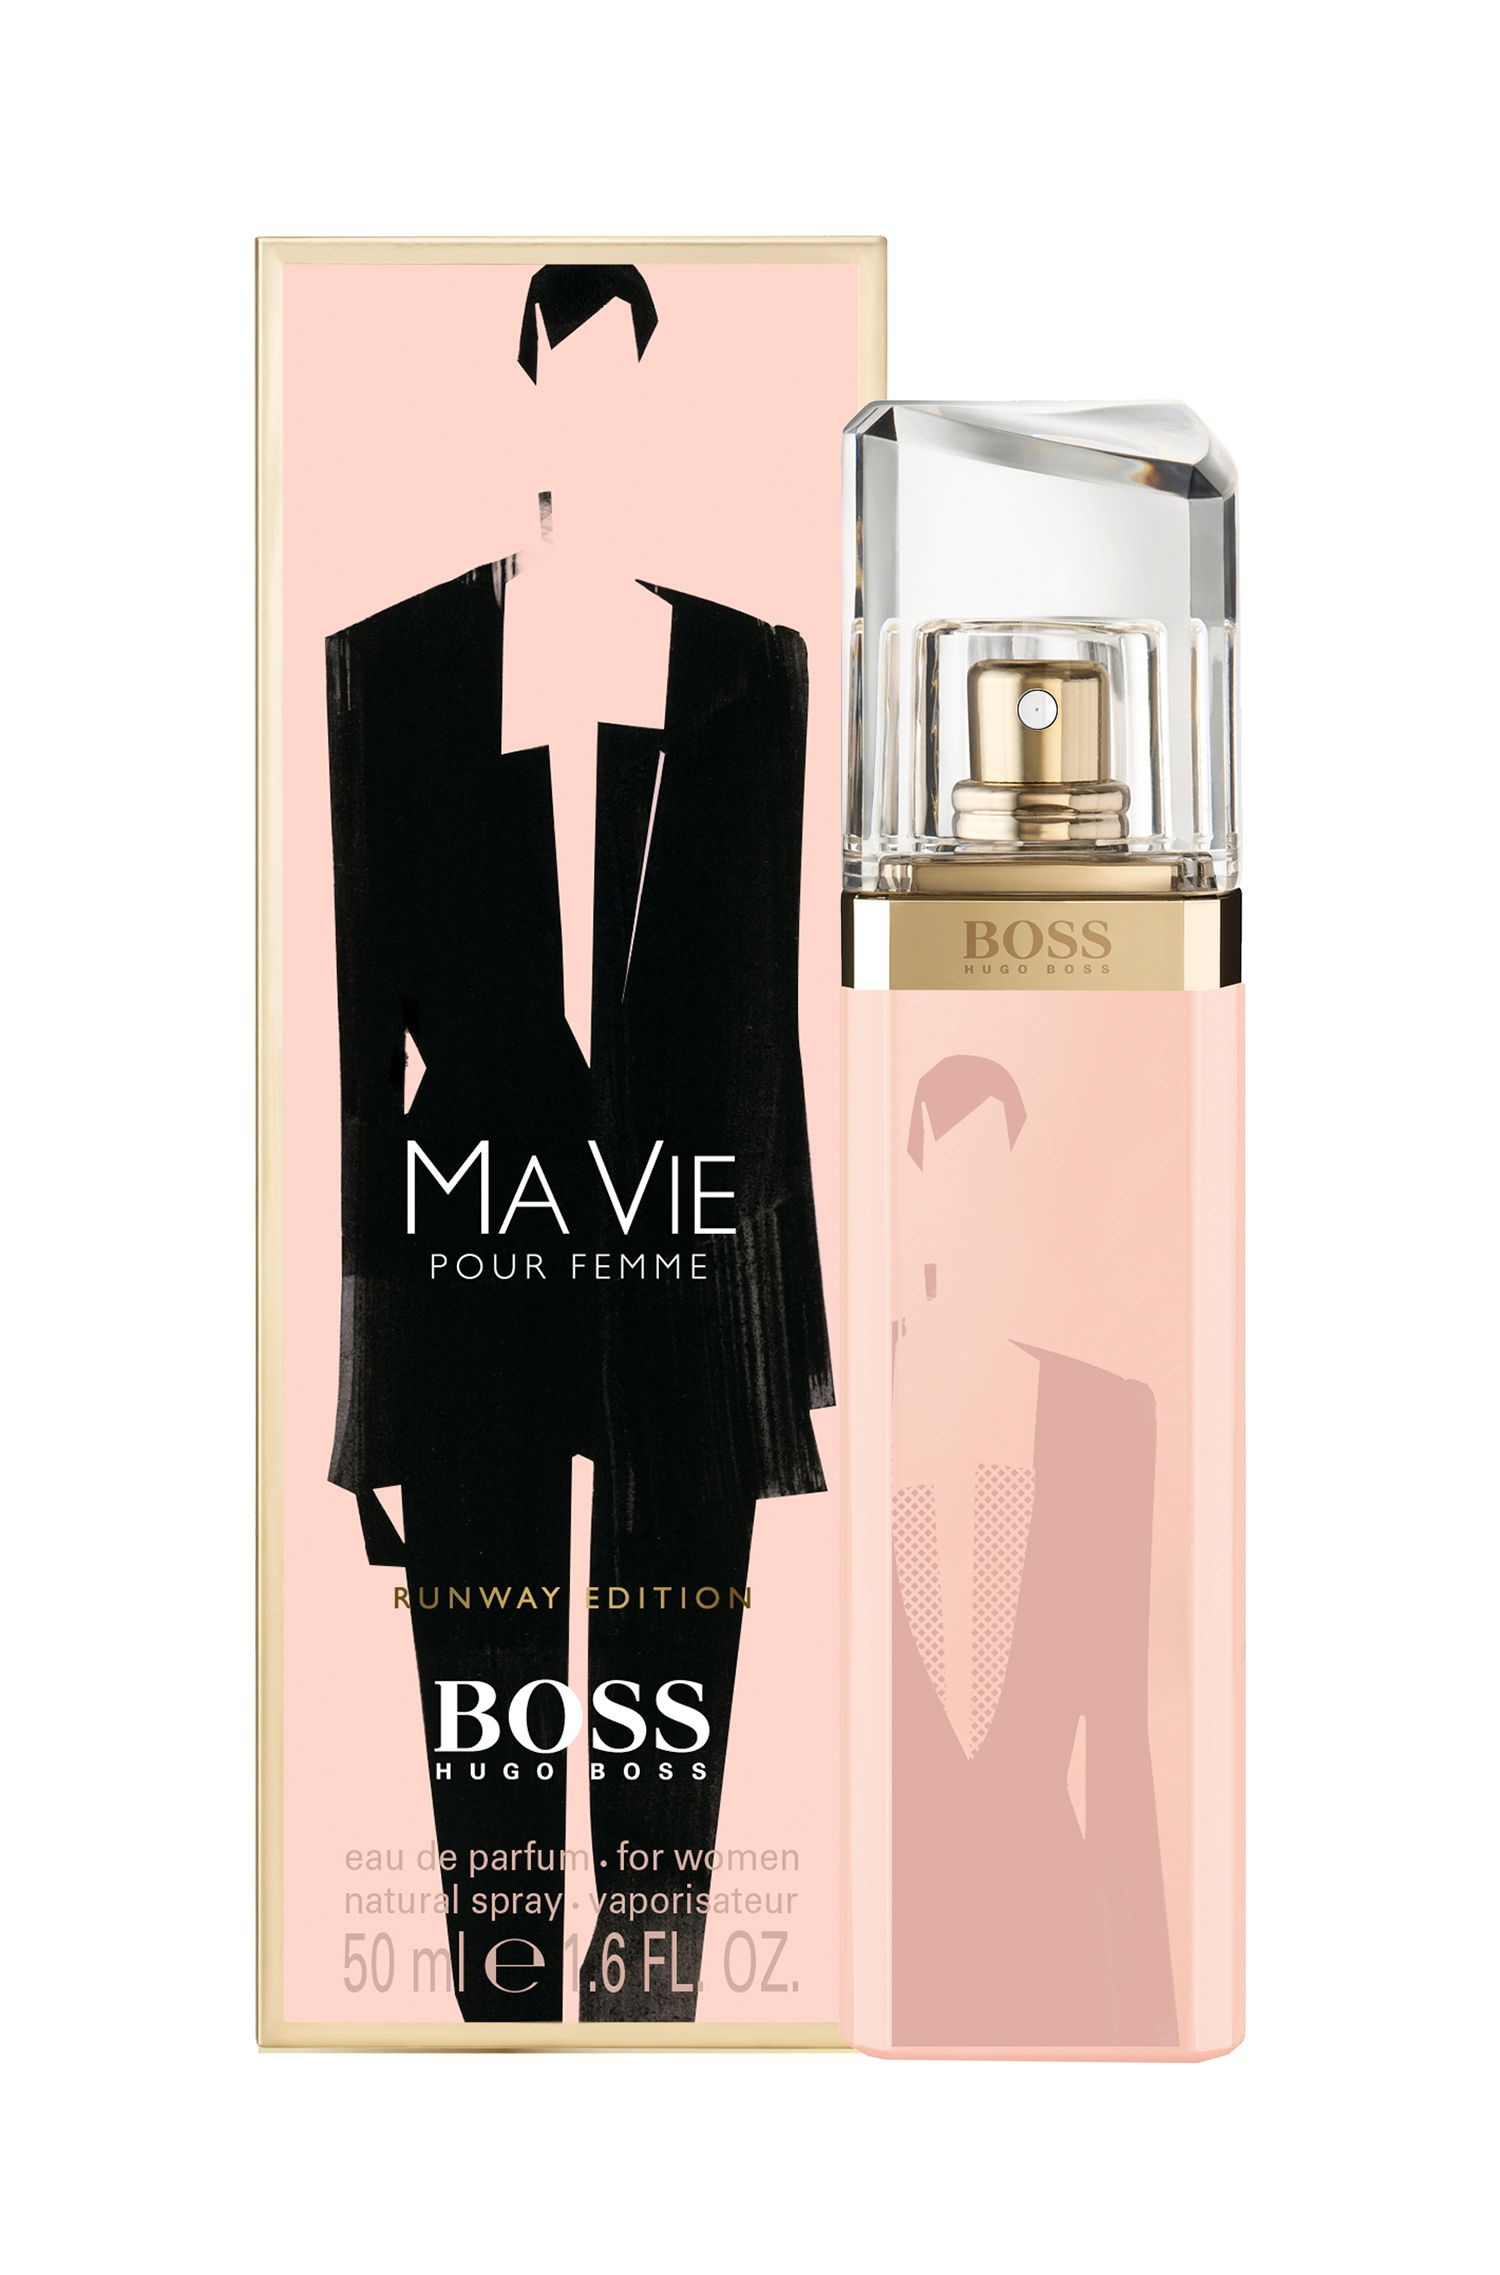 Hugo Boss Boss Ma Vie Runway Edition, Parfémovaná voda 50ml